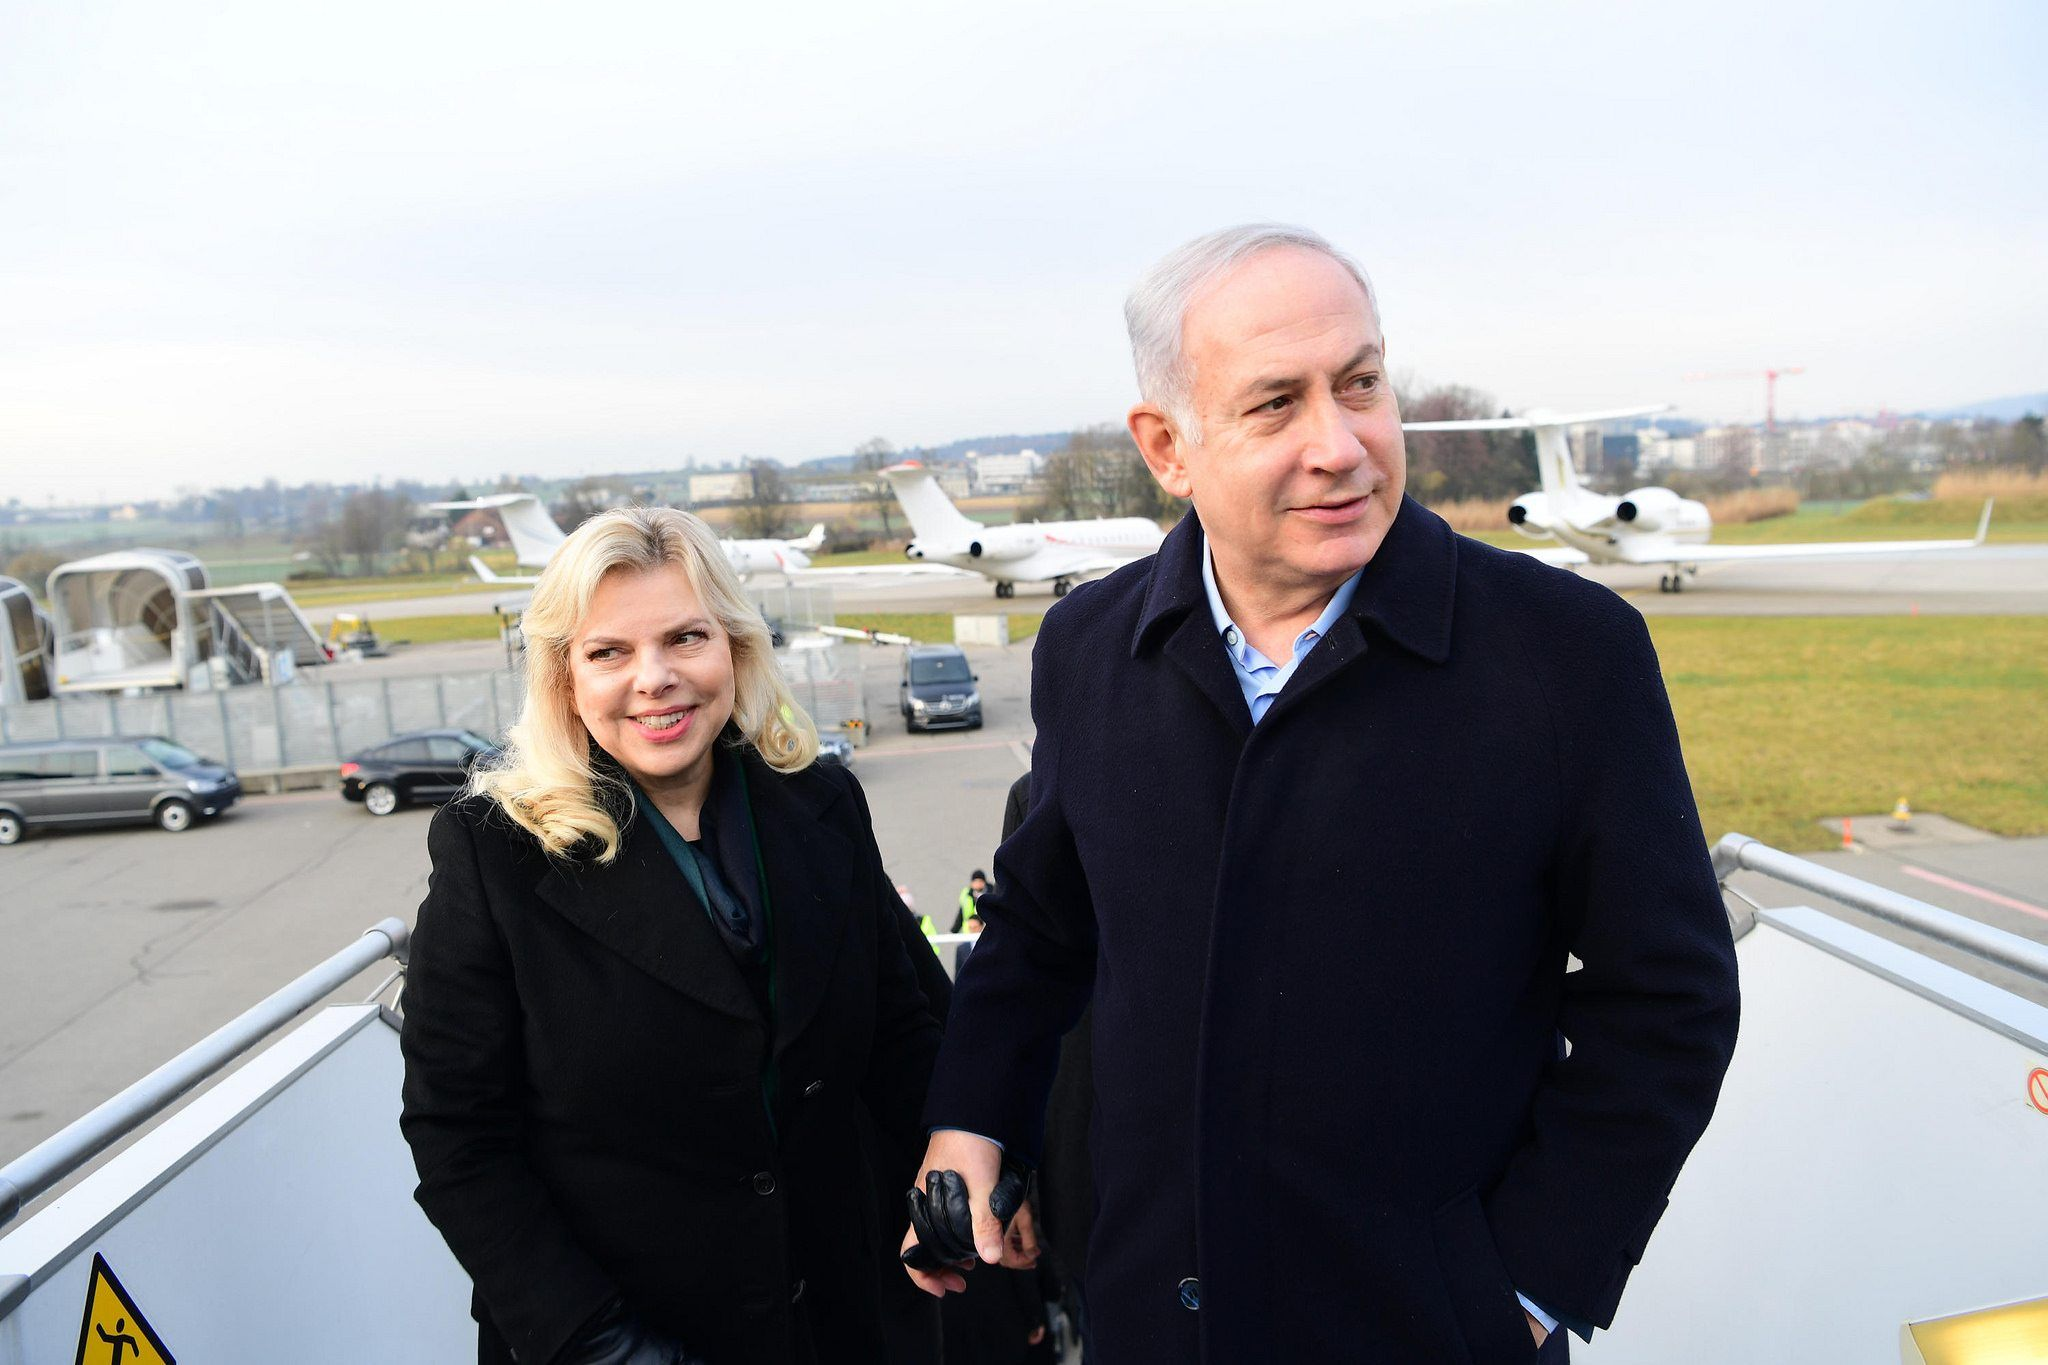 Benjamin Netanyahu advarer om Irans involvering i Libanon og Syria. (Foto: Amos Ben Gershom/Flickr)